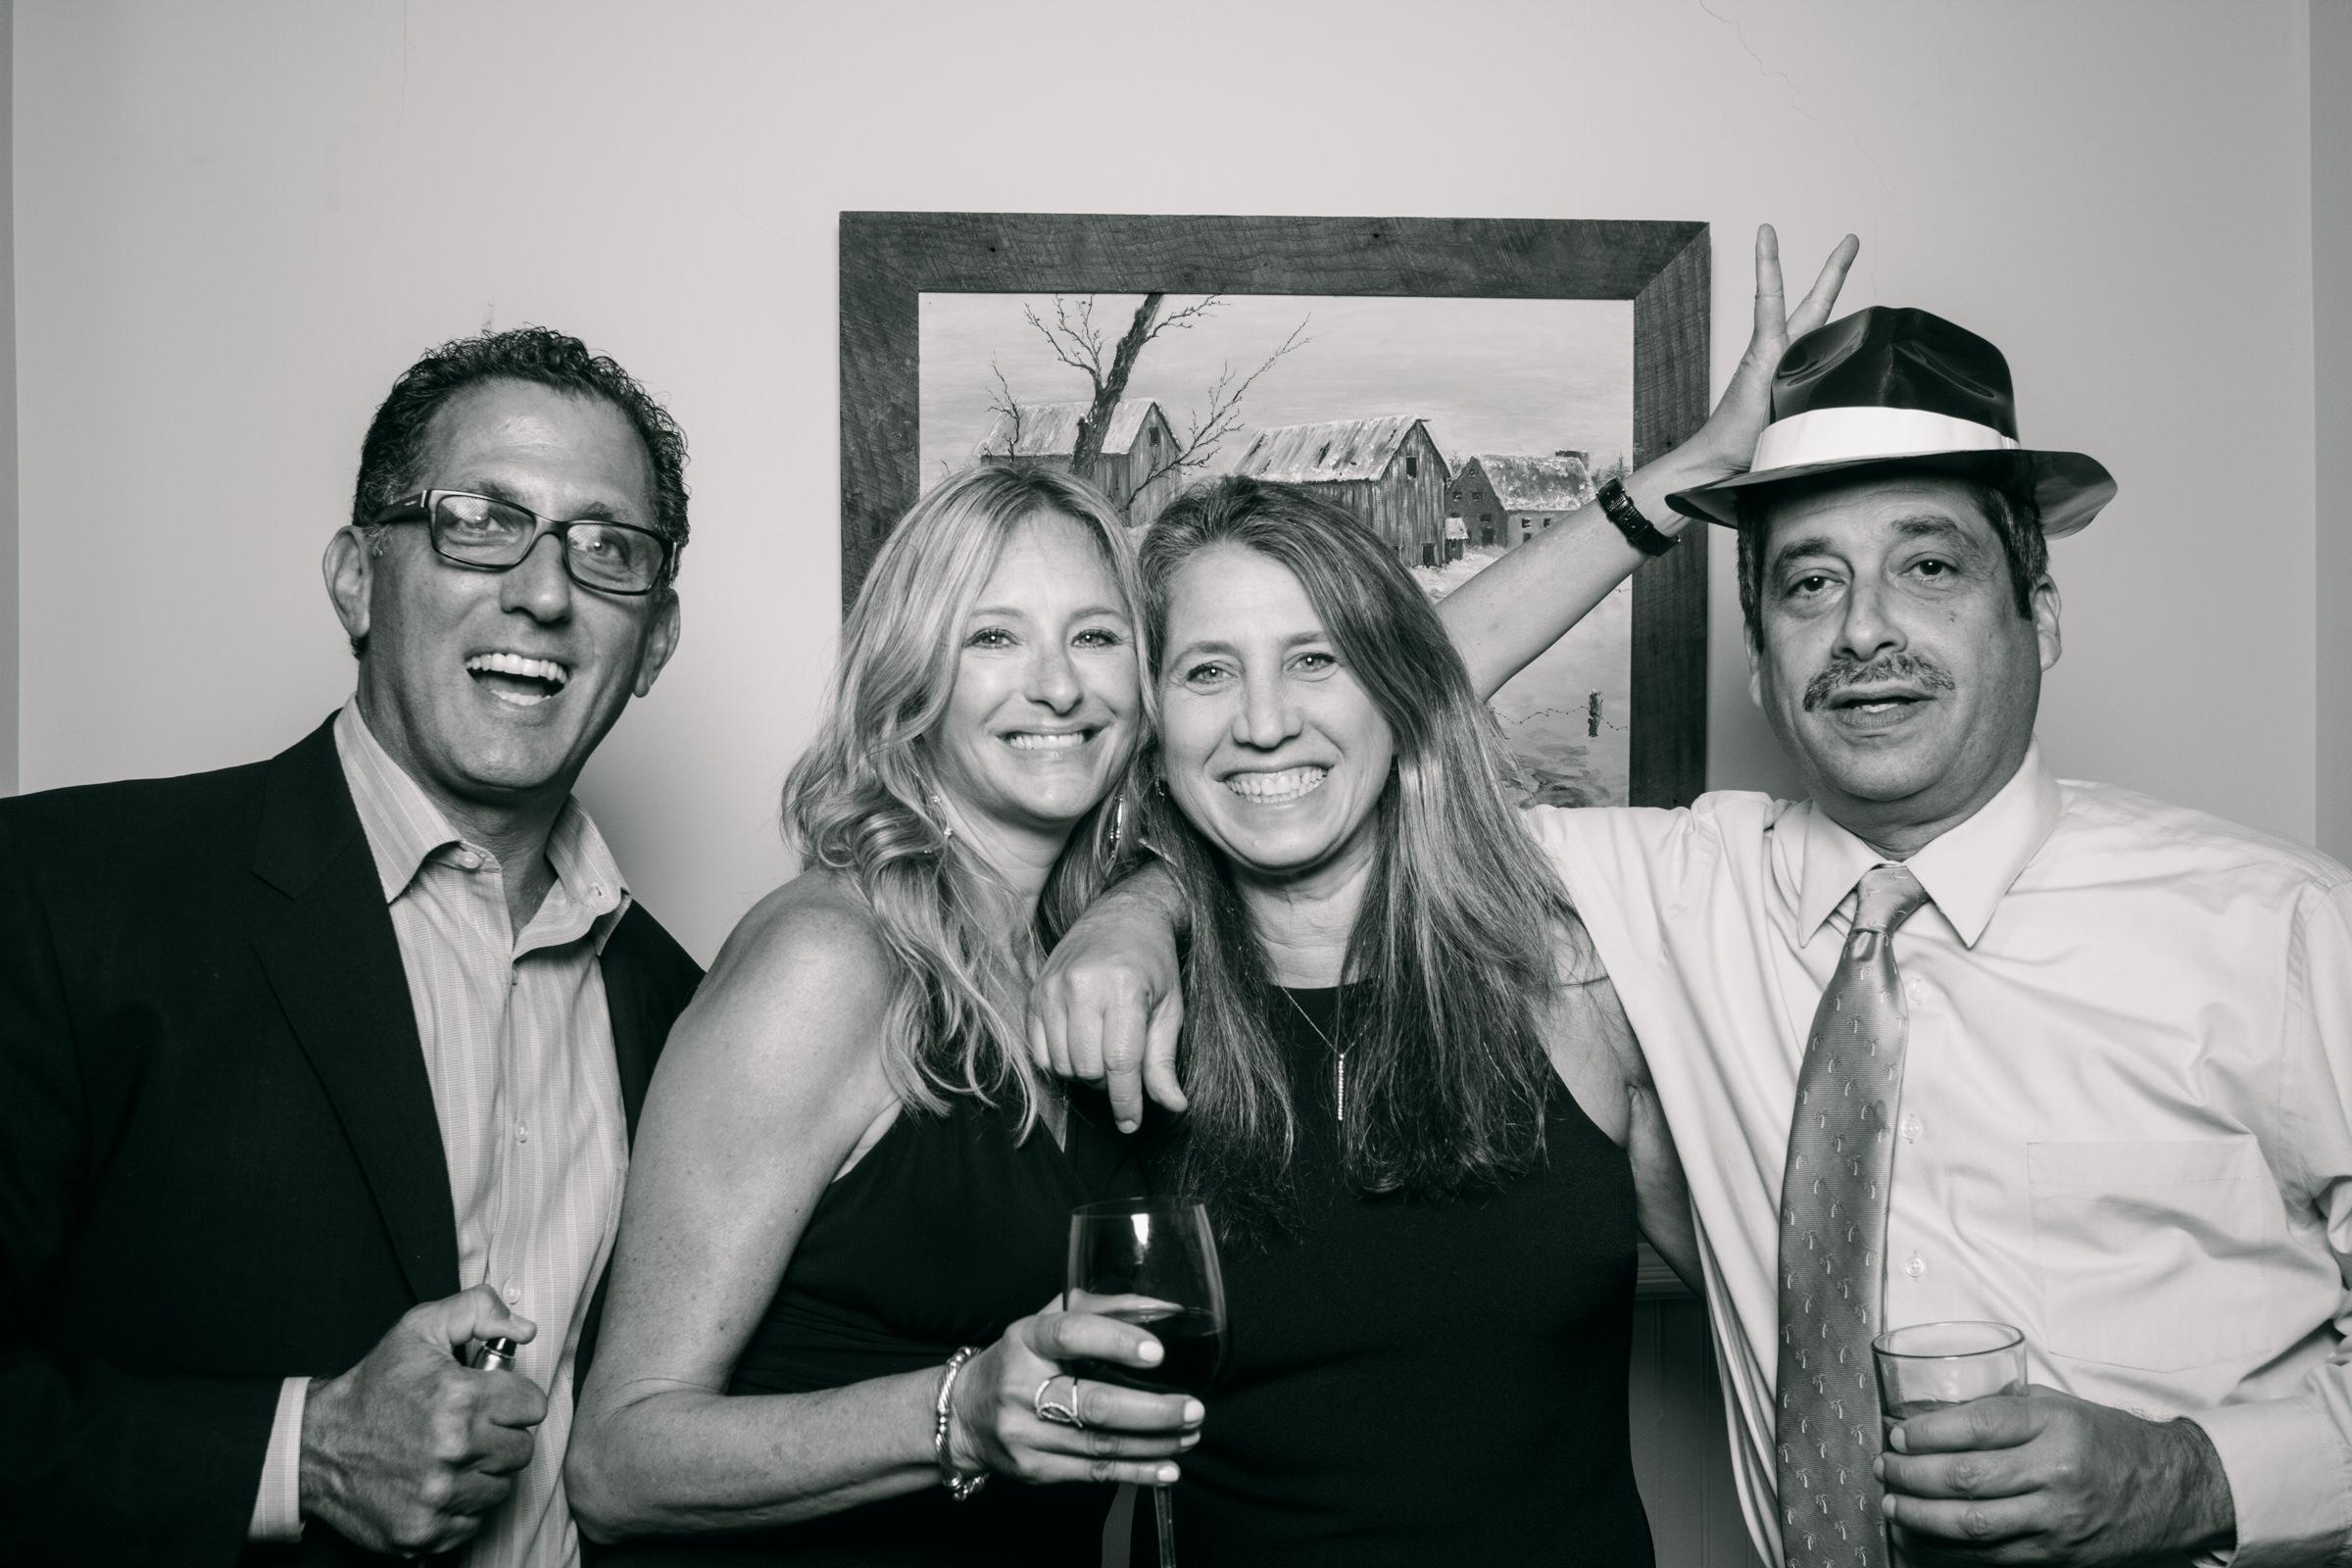 Nicole-Greg-Wedding-Photo-Booth-Lodge-Mountain-Springs-5.jpg